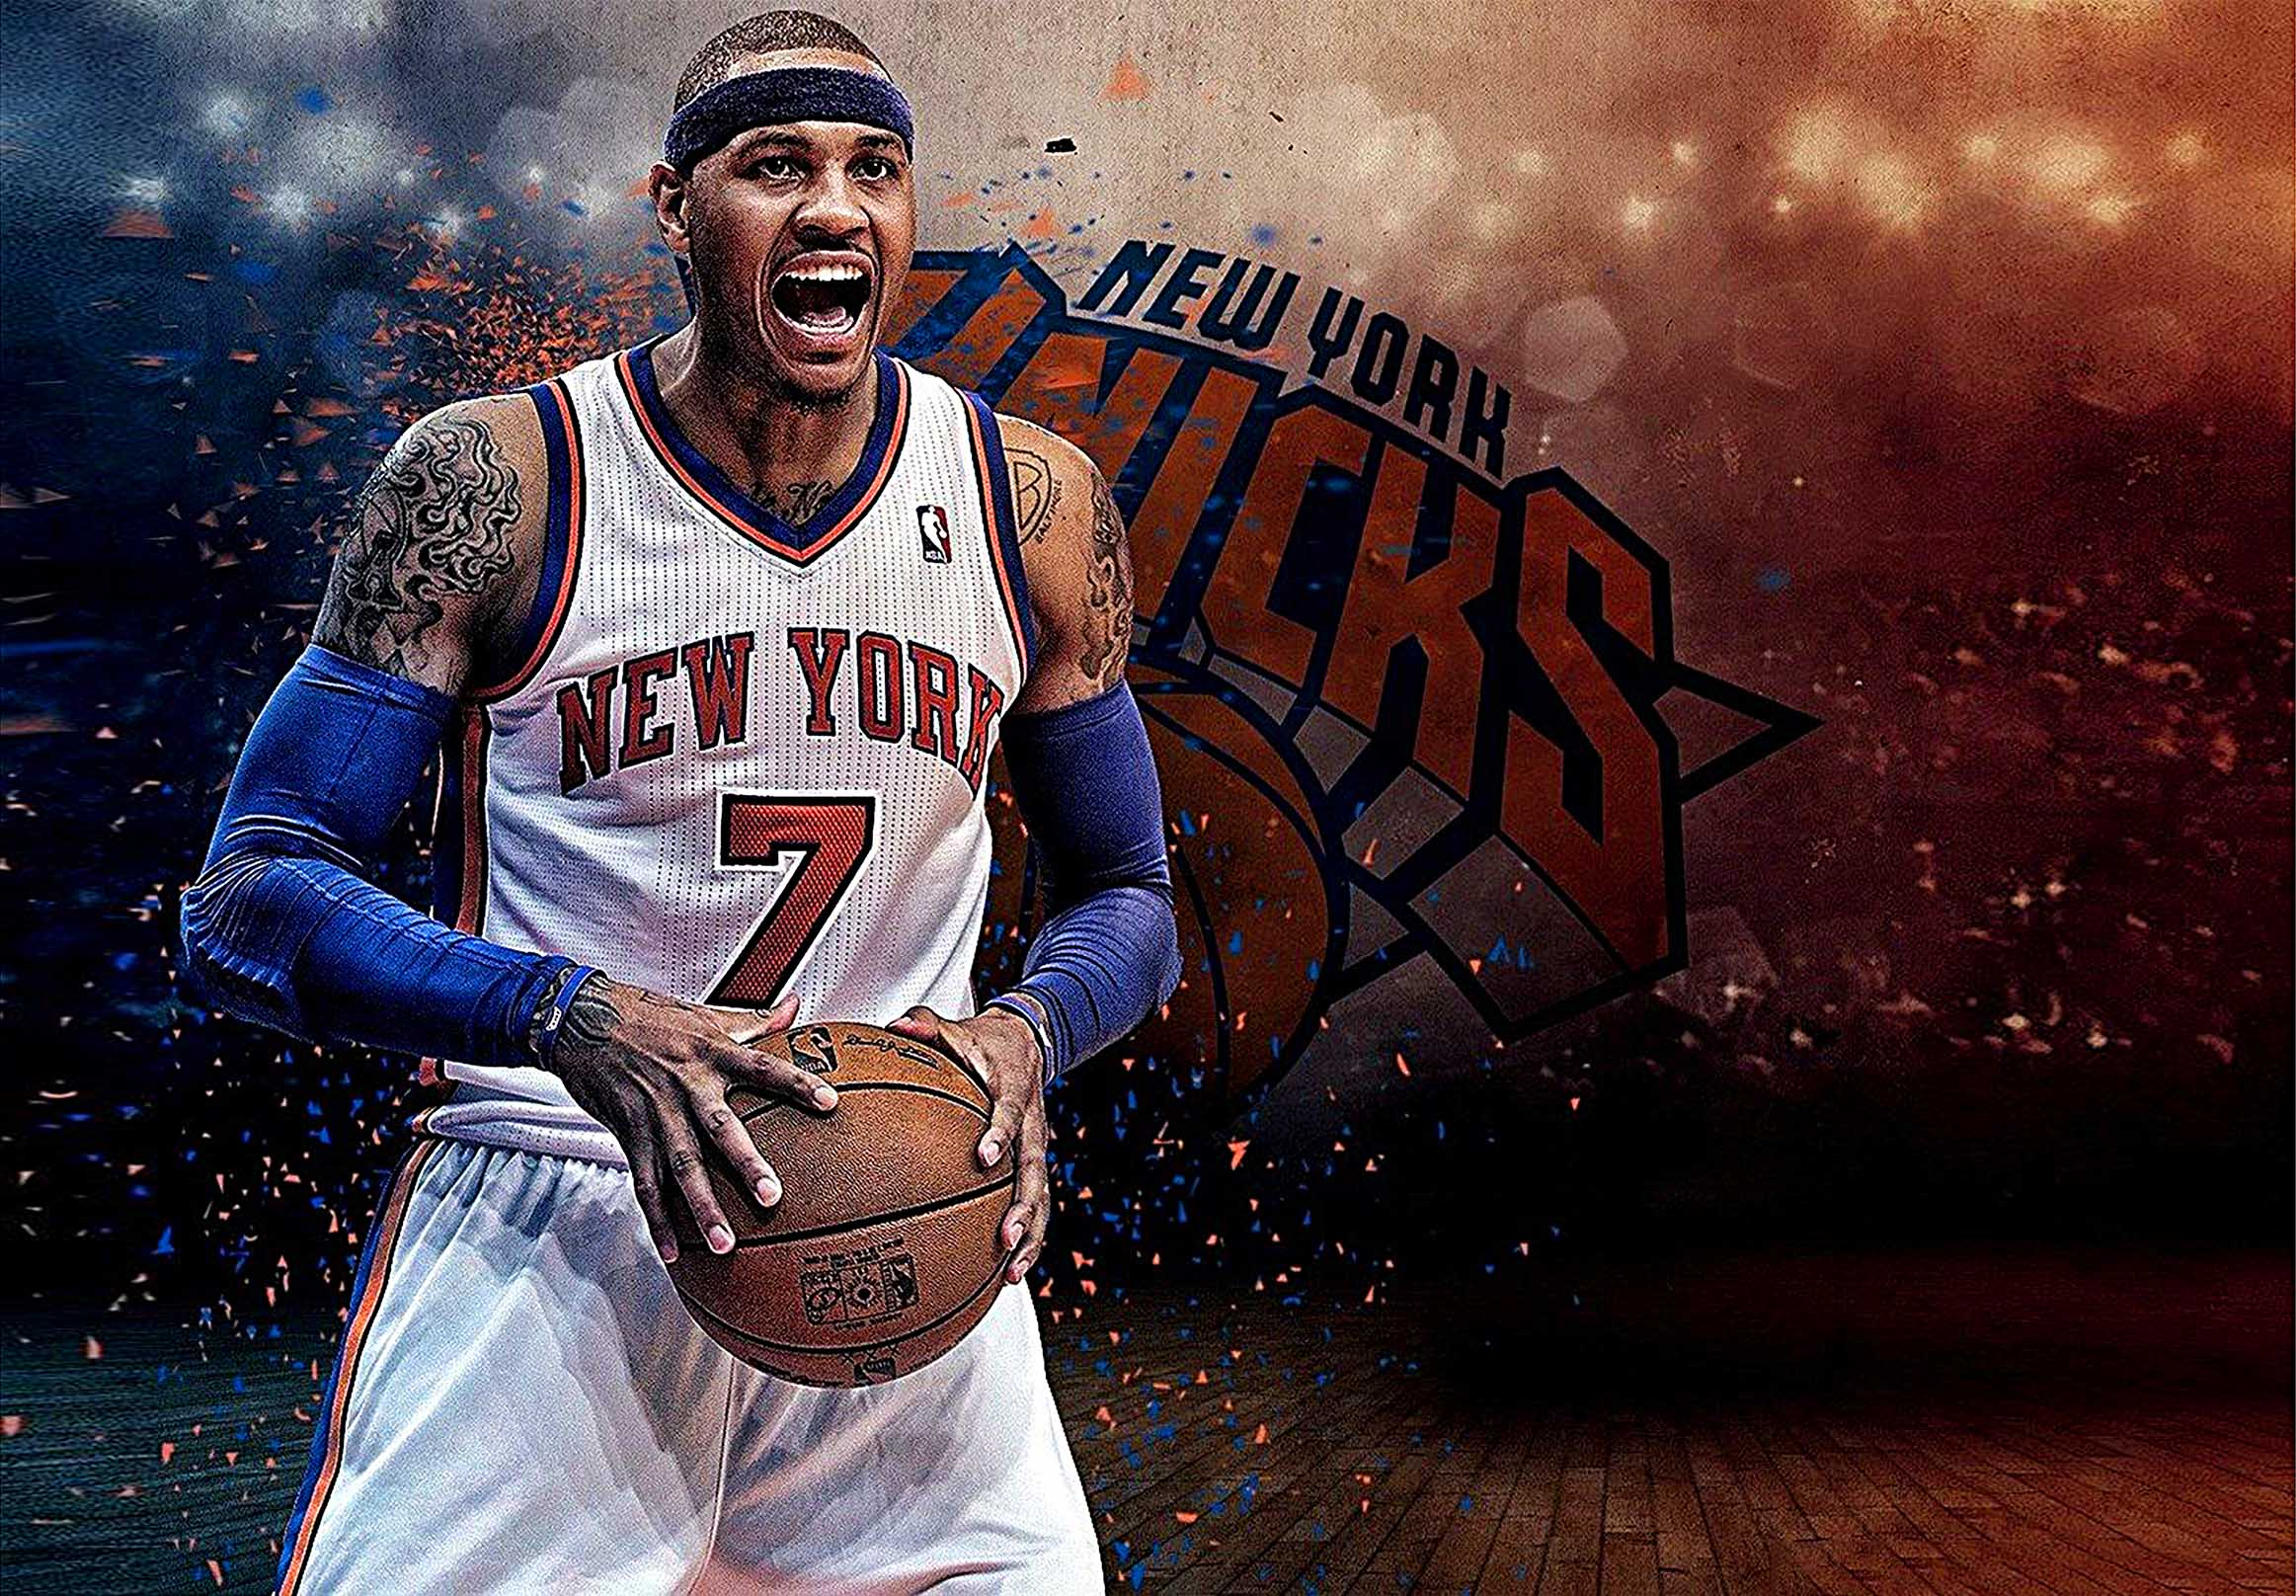 New York Knicks Carmelo Anthony  Canvas Tablo (Nba-canvas-CarmeloAnthony)